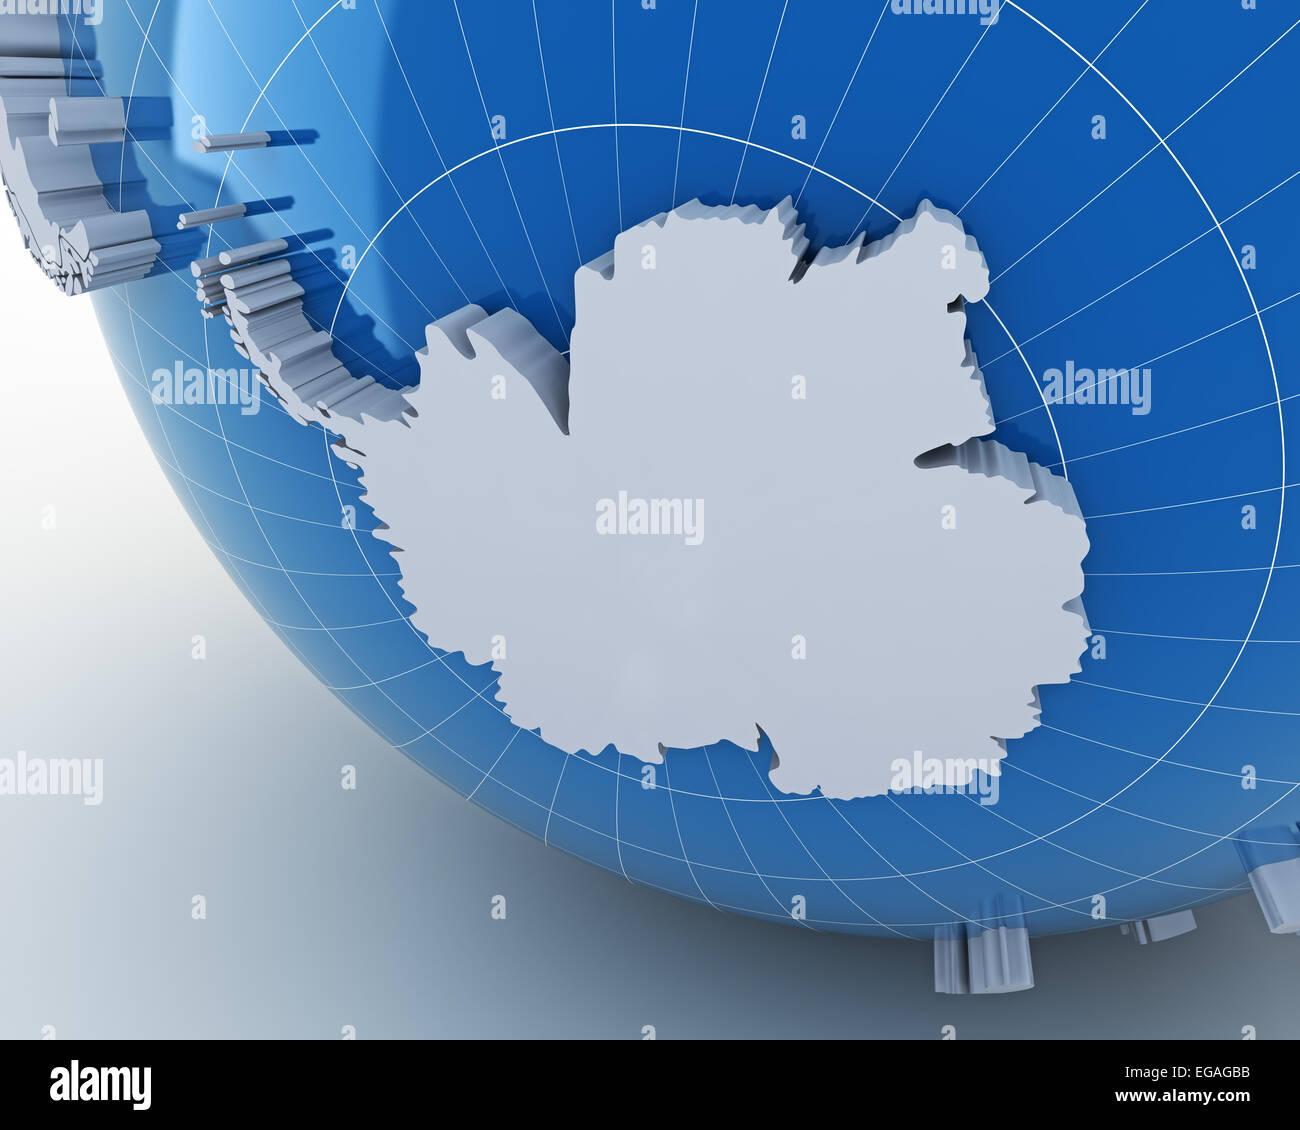 Globe antarctica earth world stock photos globe antarctica earth globe with antarctica 3d render stock image gumiabroncs Image collections